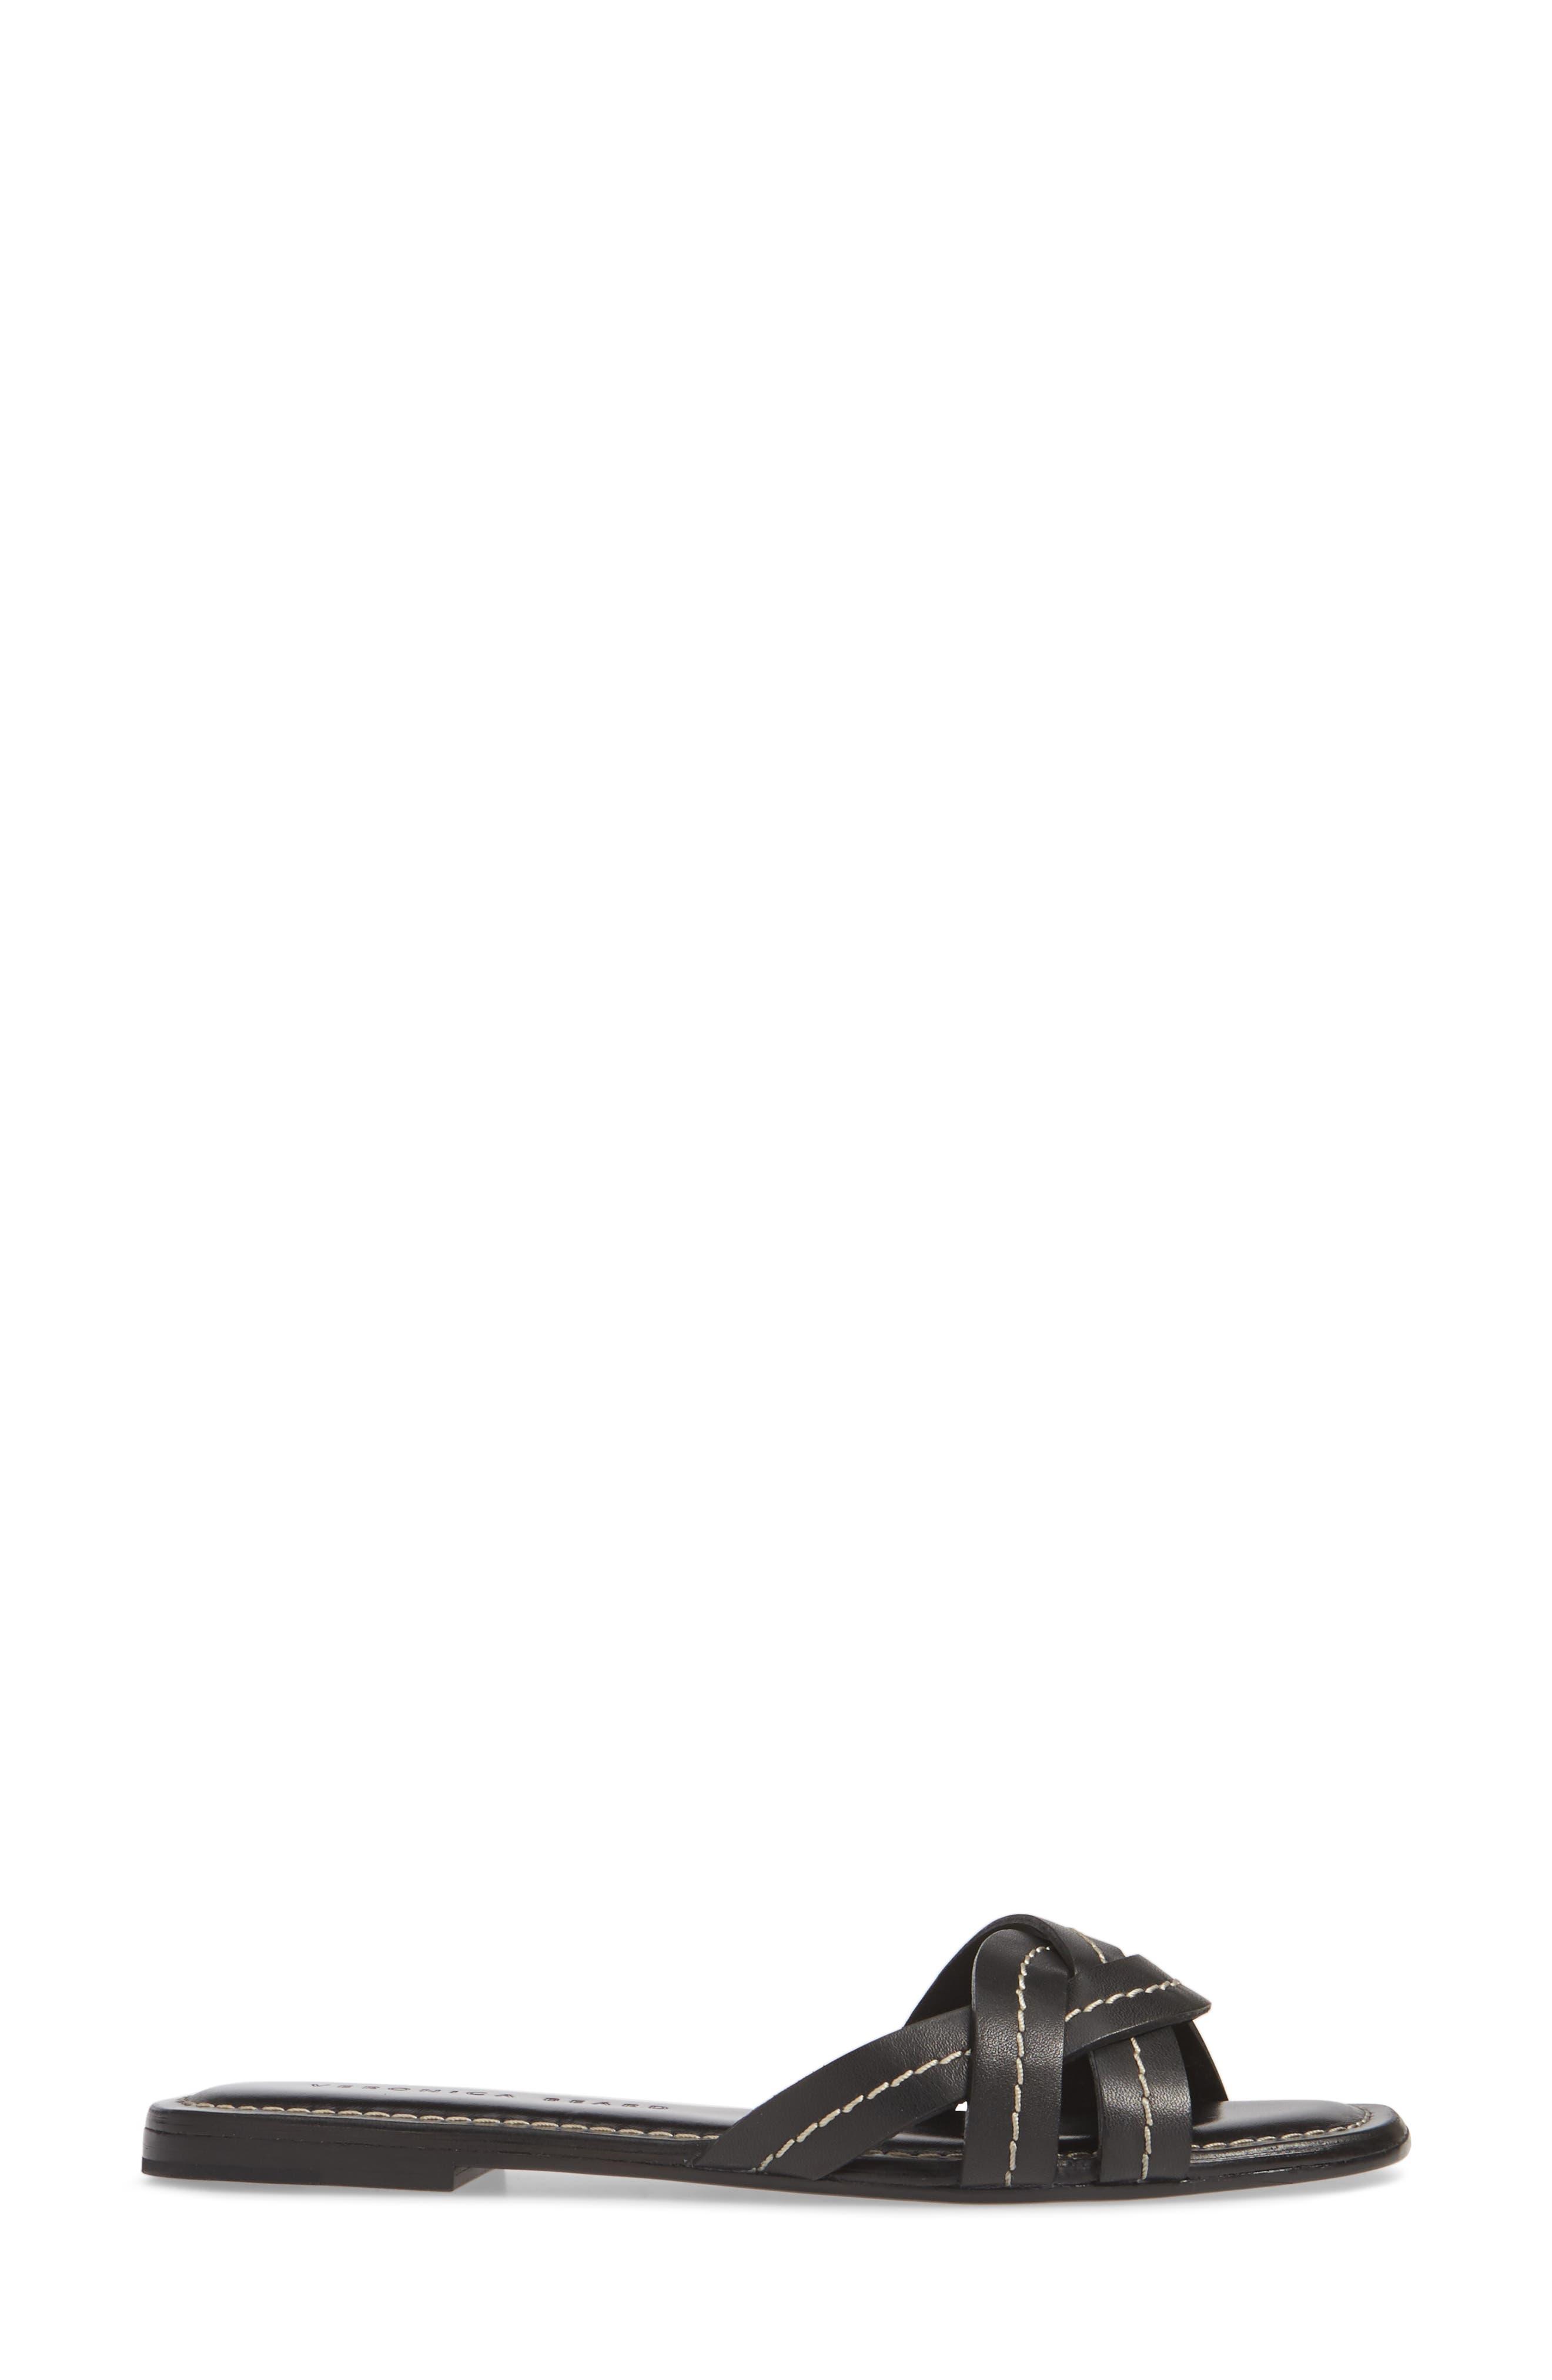 VERONICA BEARD, Maili Flat, Alternate thumbnail 3, color, BLACK